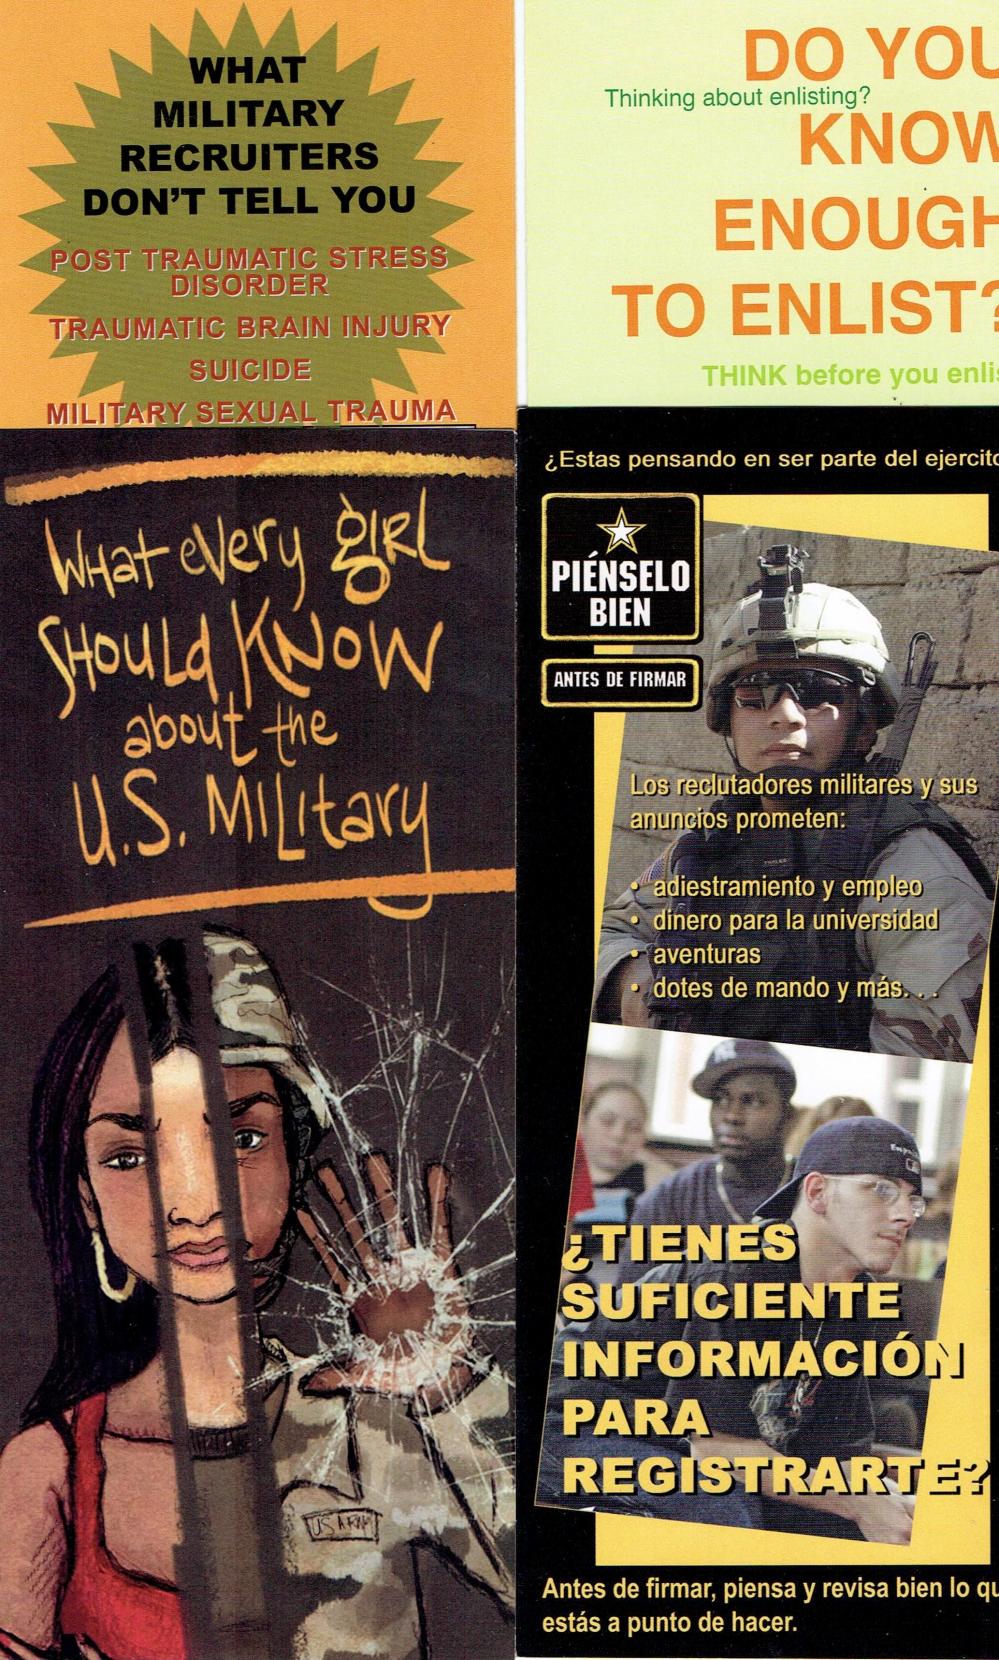 Brochure images